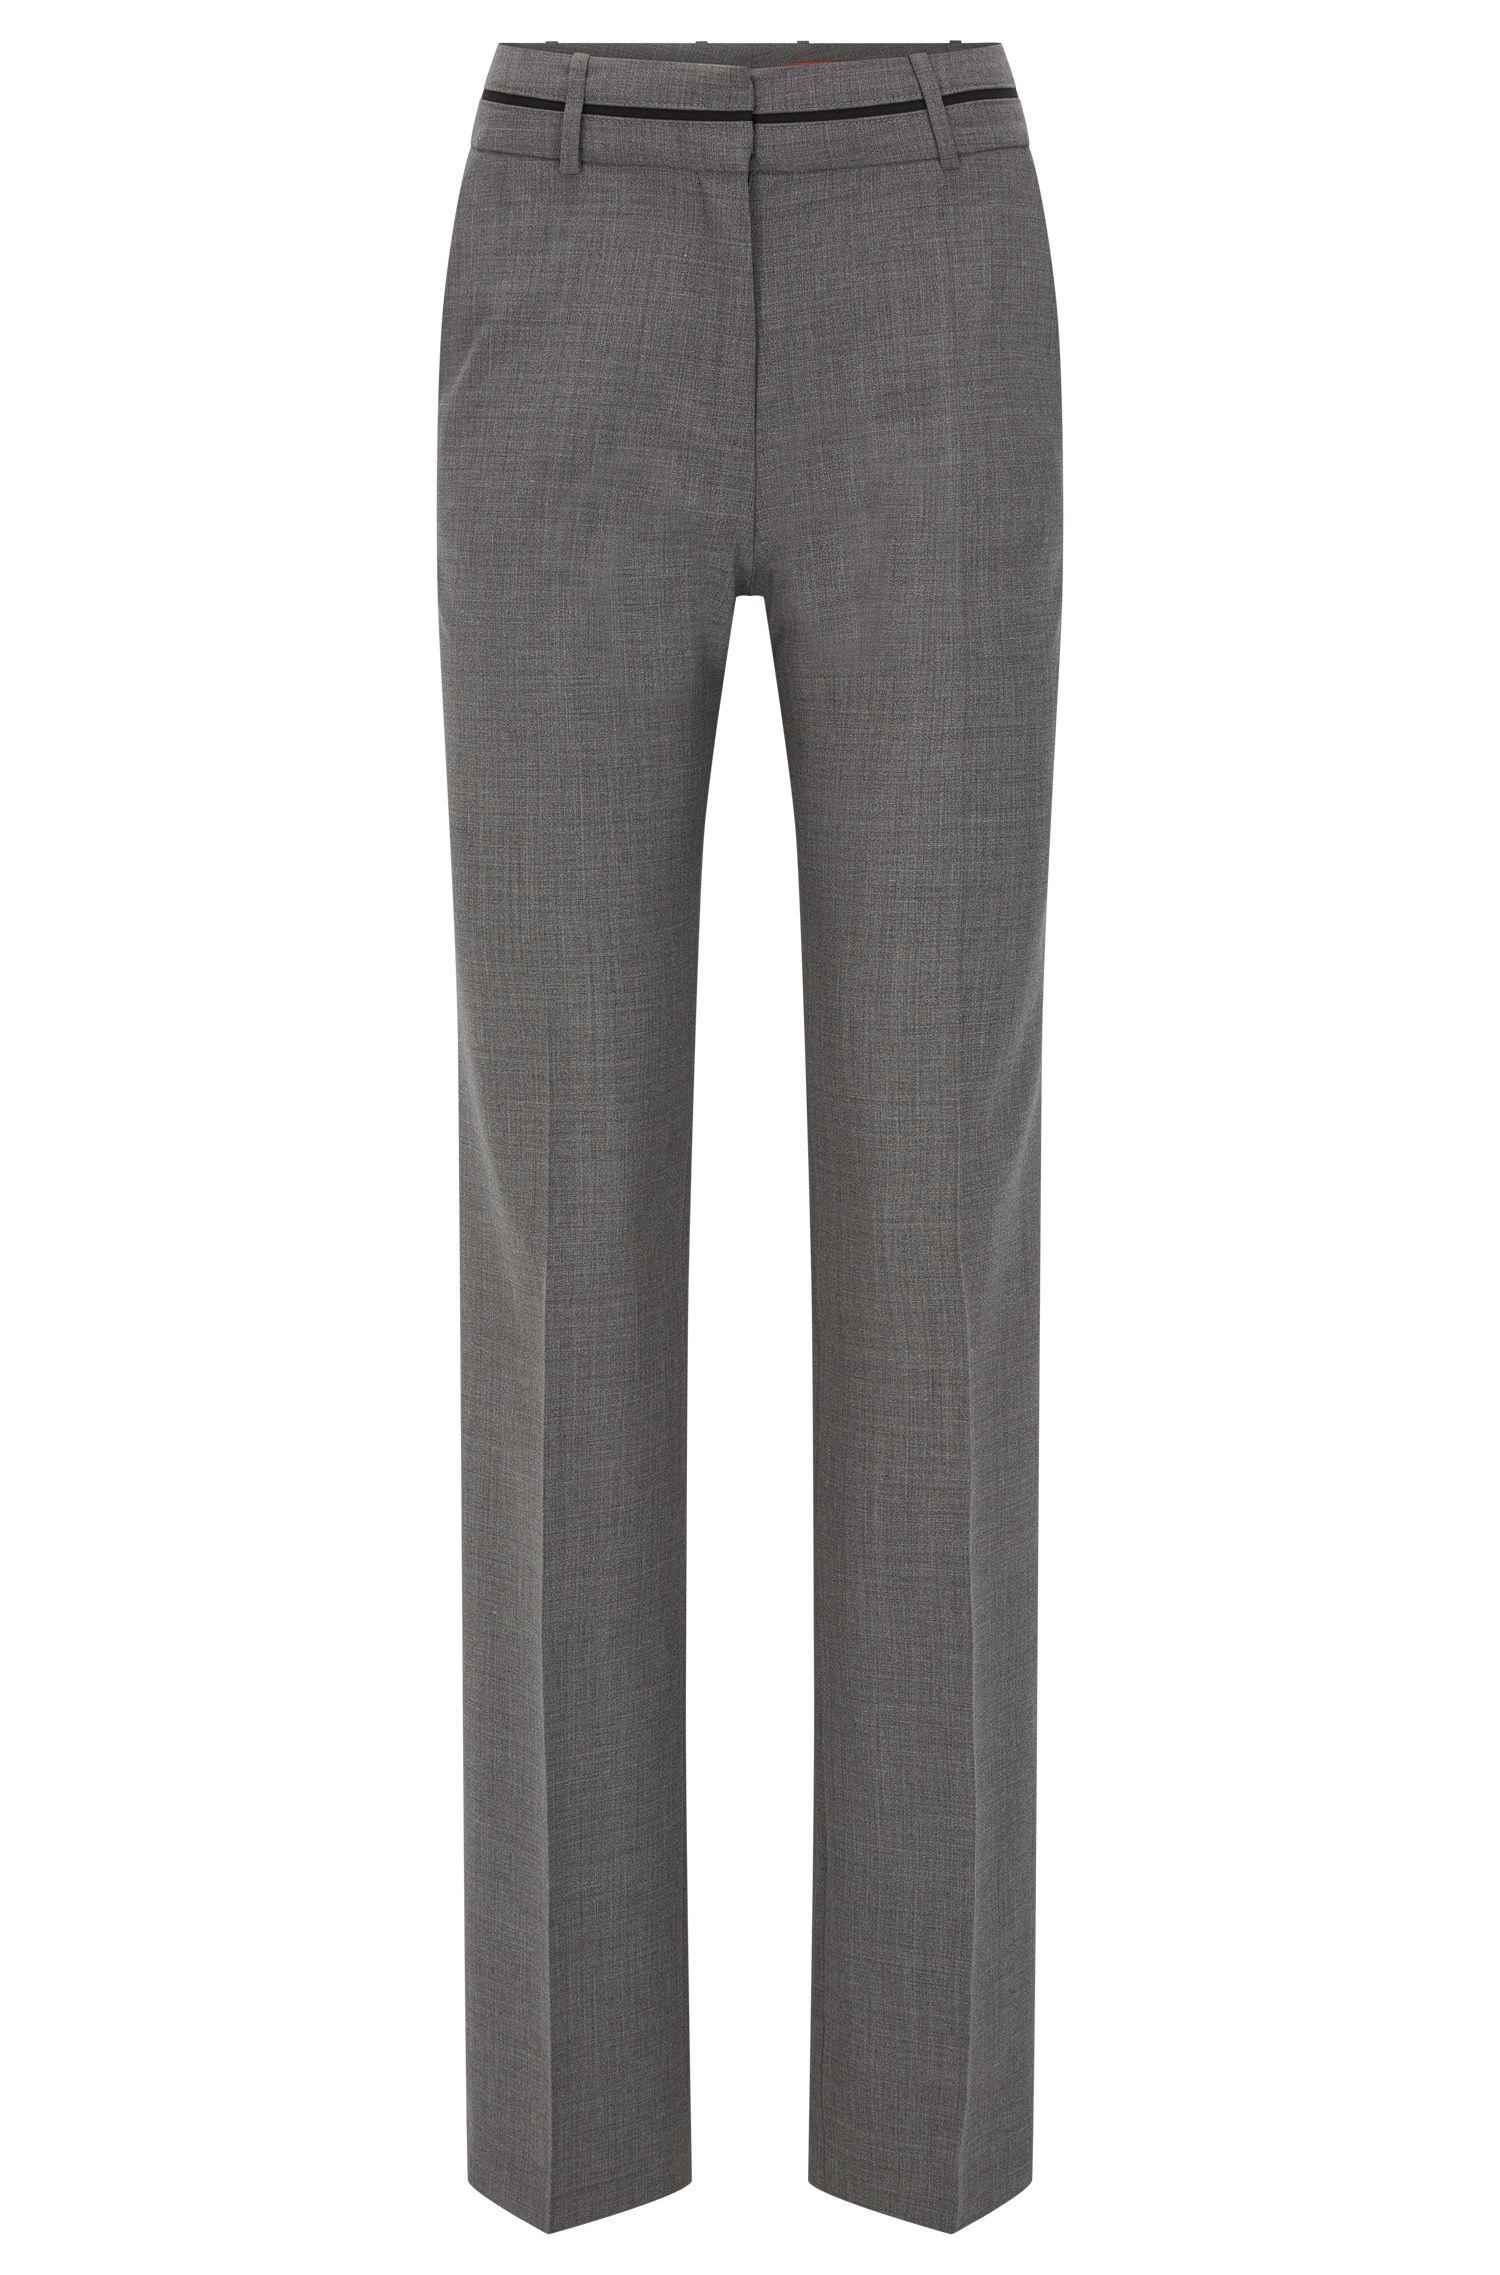 Pantaloni regular fit in misto lana vergine